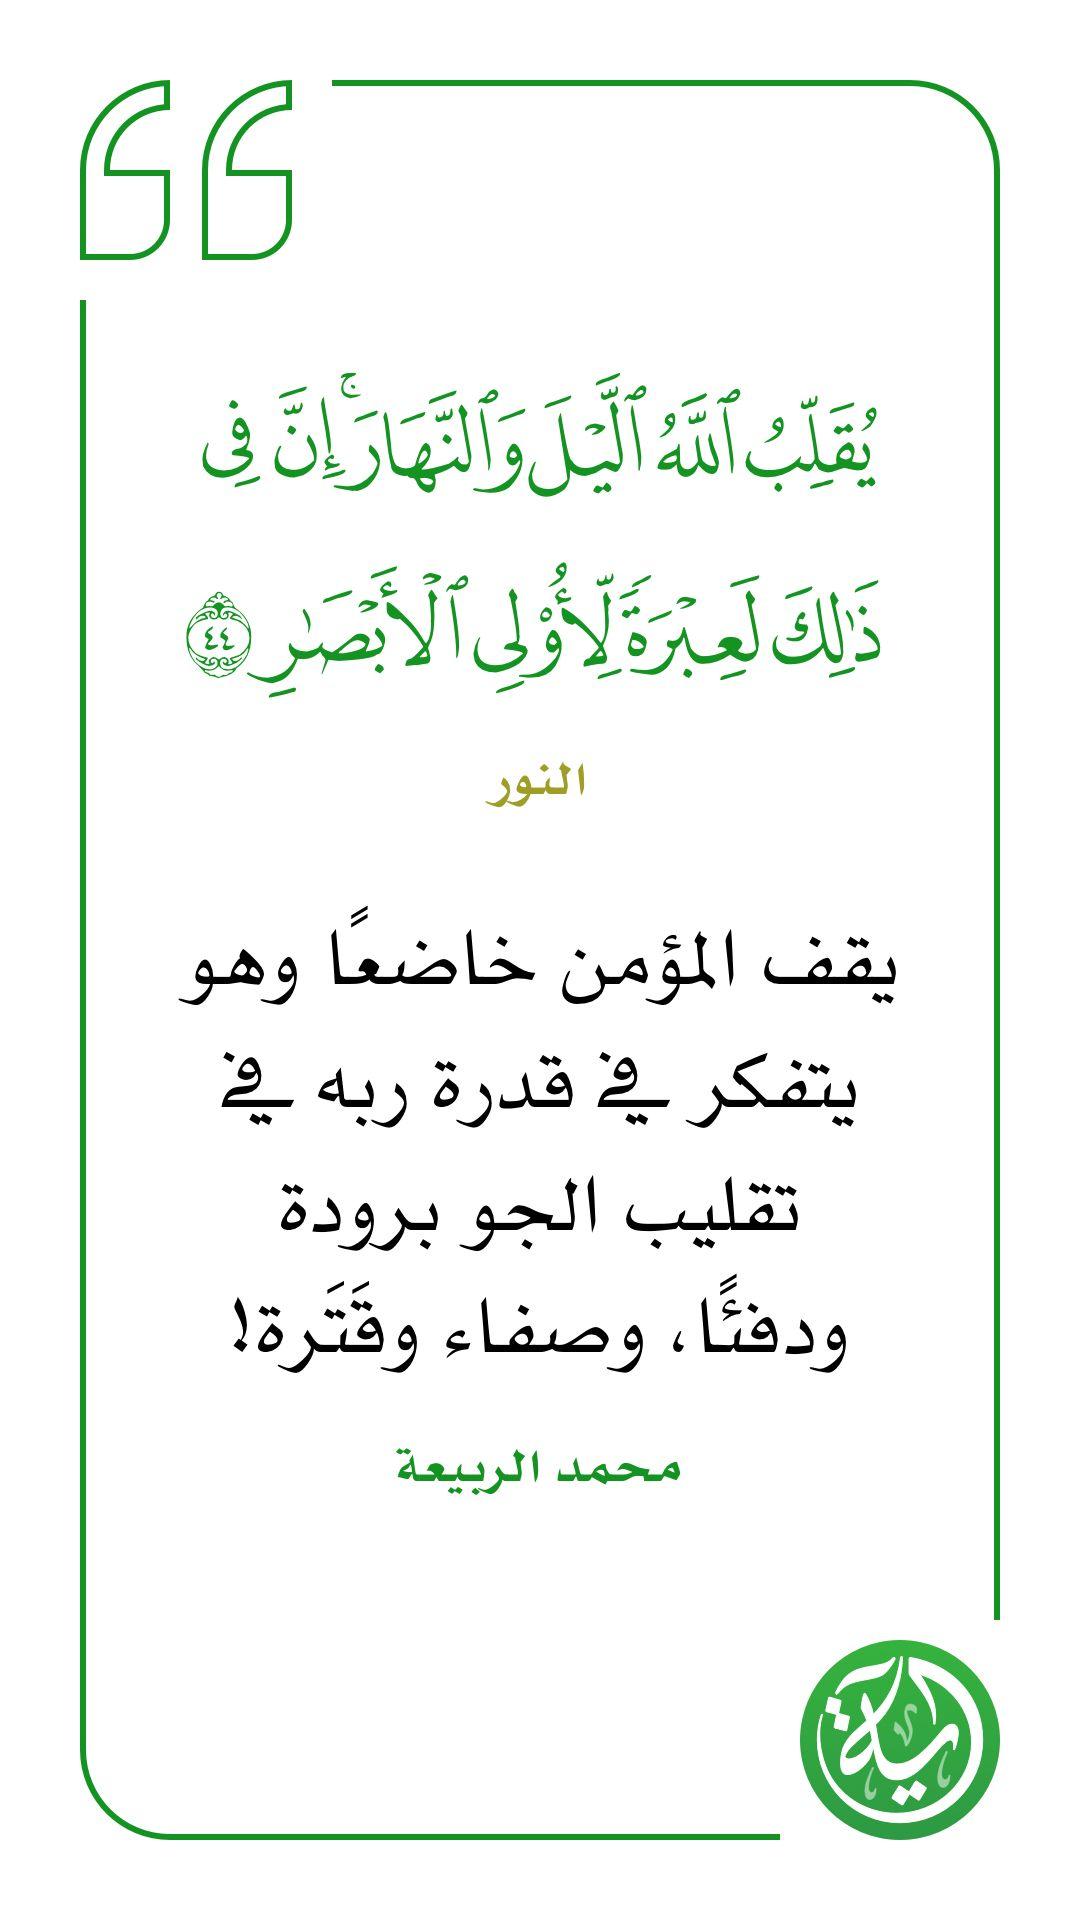 Pin By فوزيه بوشهري On إسلامي Quran Quotes Quran Verses Islamic Quotes Quran